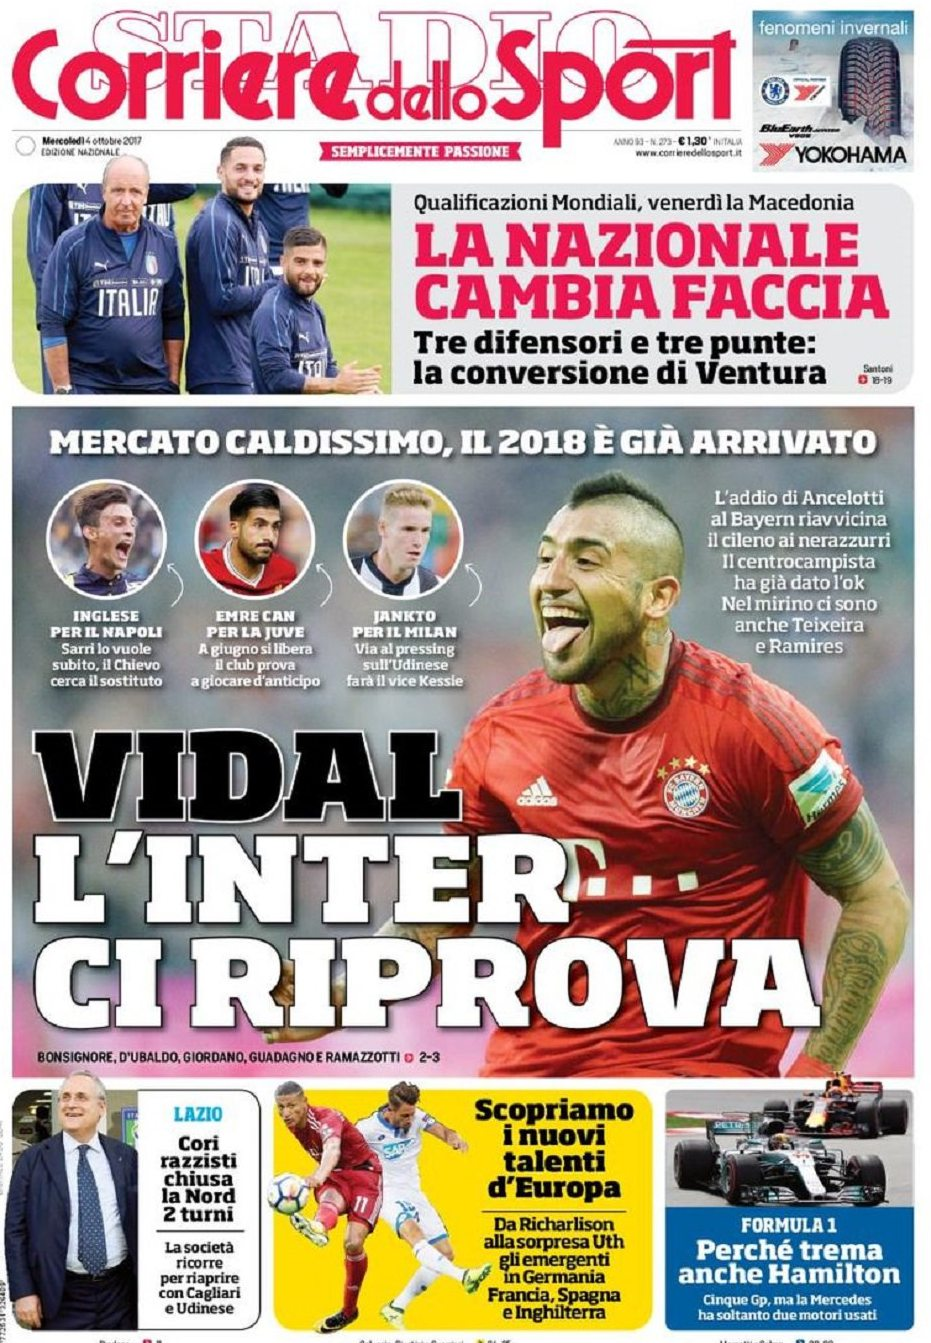 Corriere sport Vidal